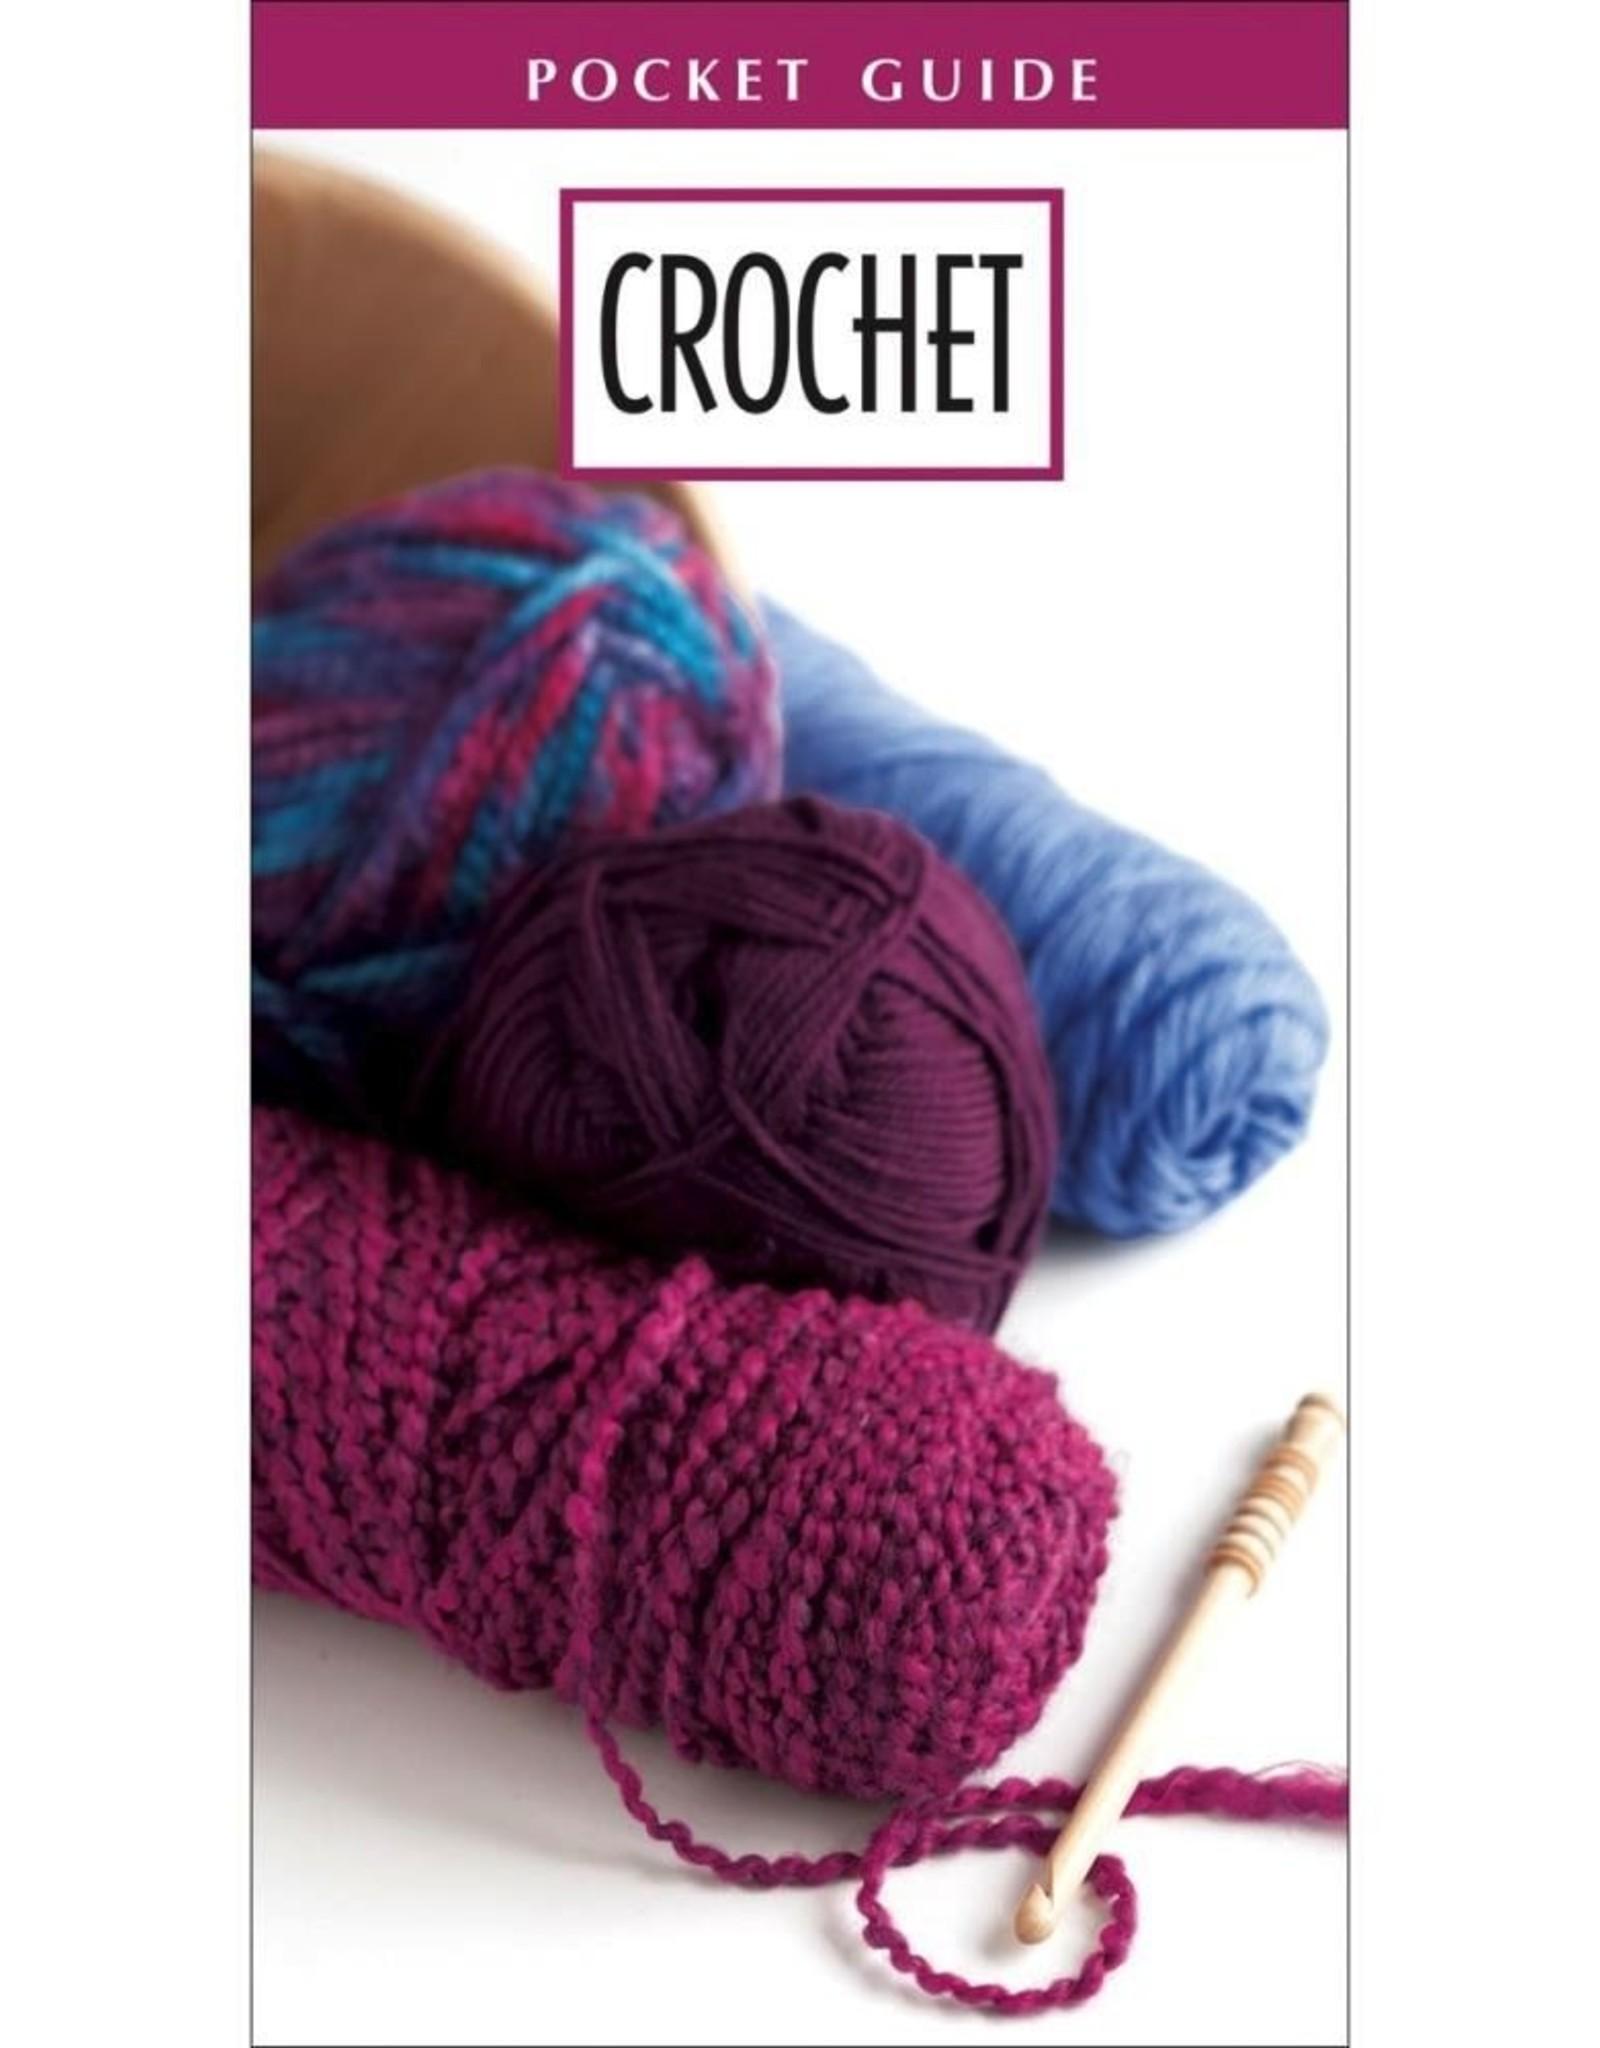 Leisure Arts - Crochet Pocket Guide